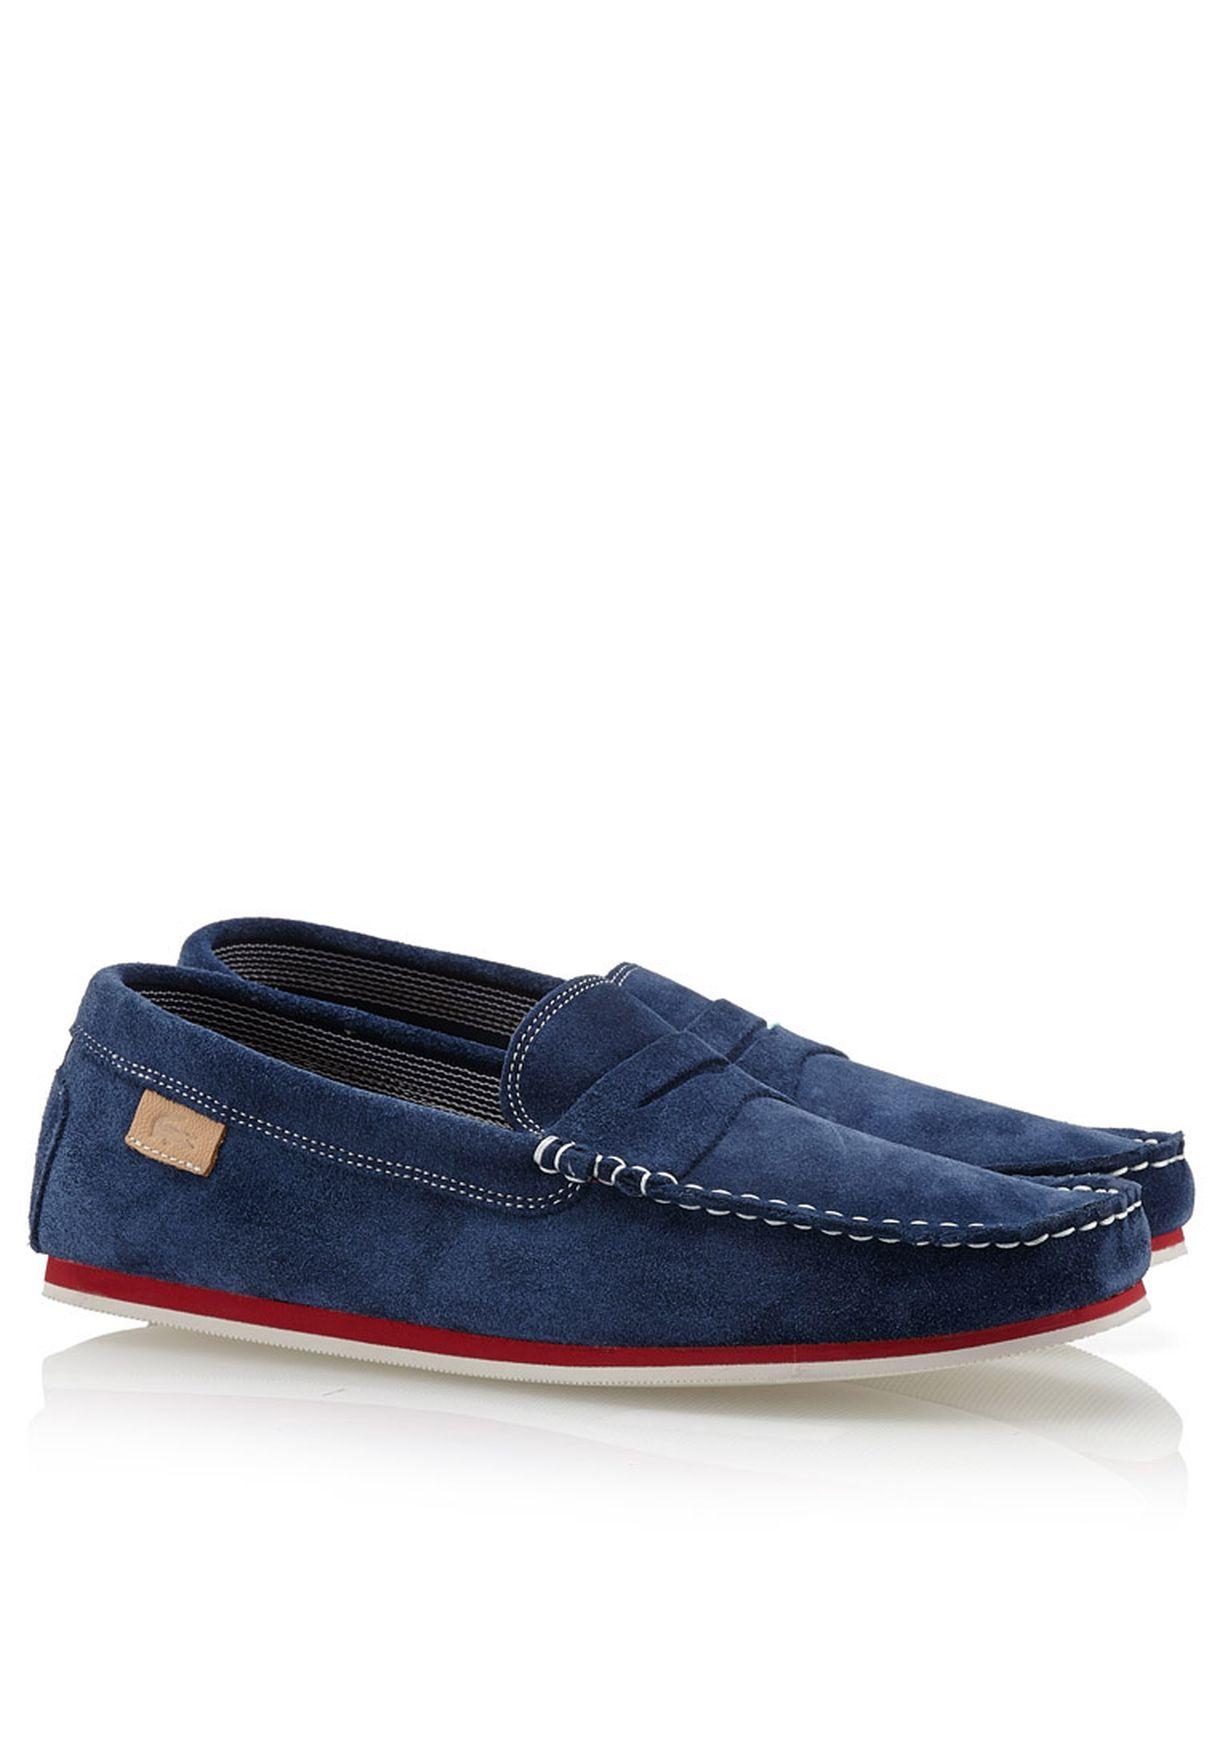 8c8dd5925a972 Shop Lacoste blue Loafers  amp  Mocassins 27SRM1211-120 for Men in ...